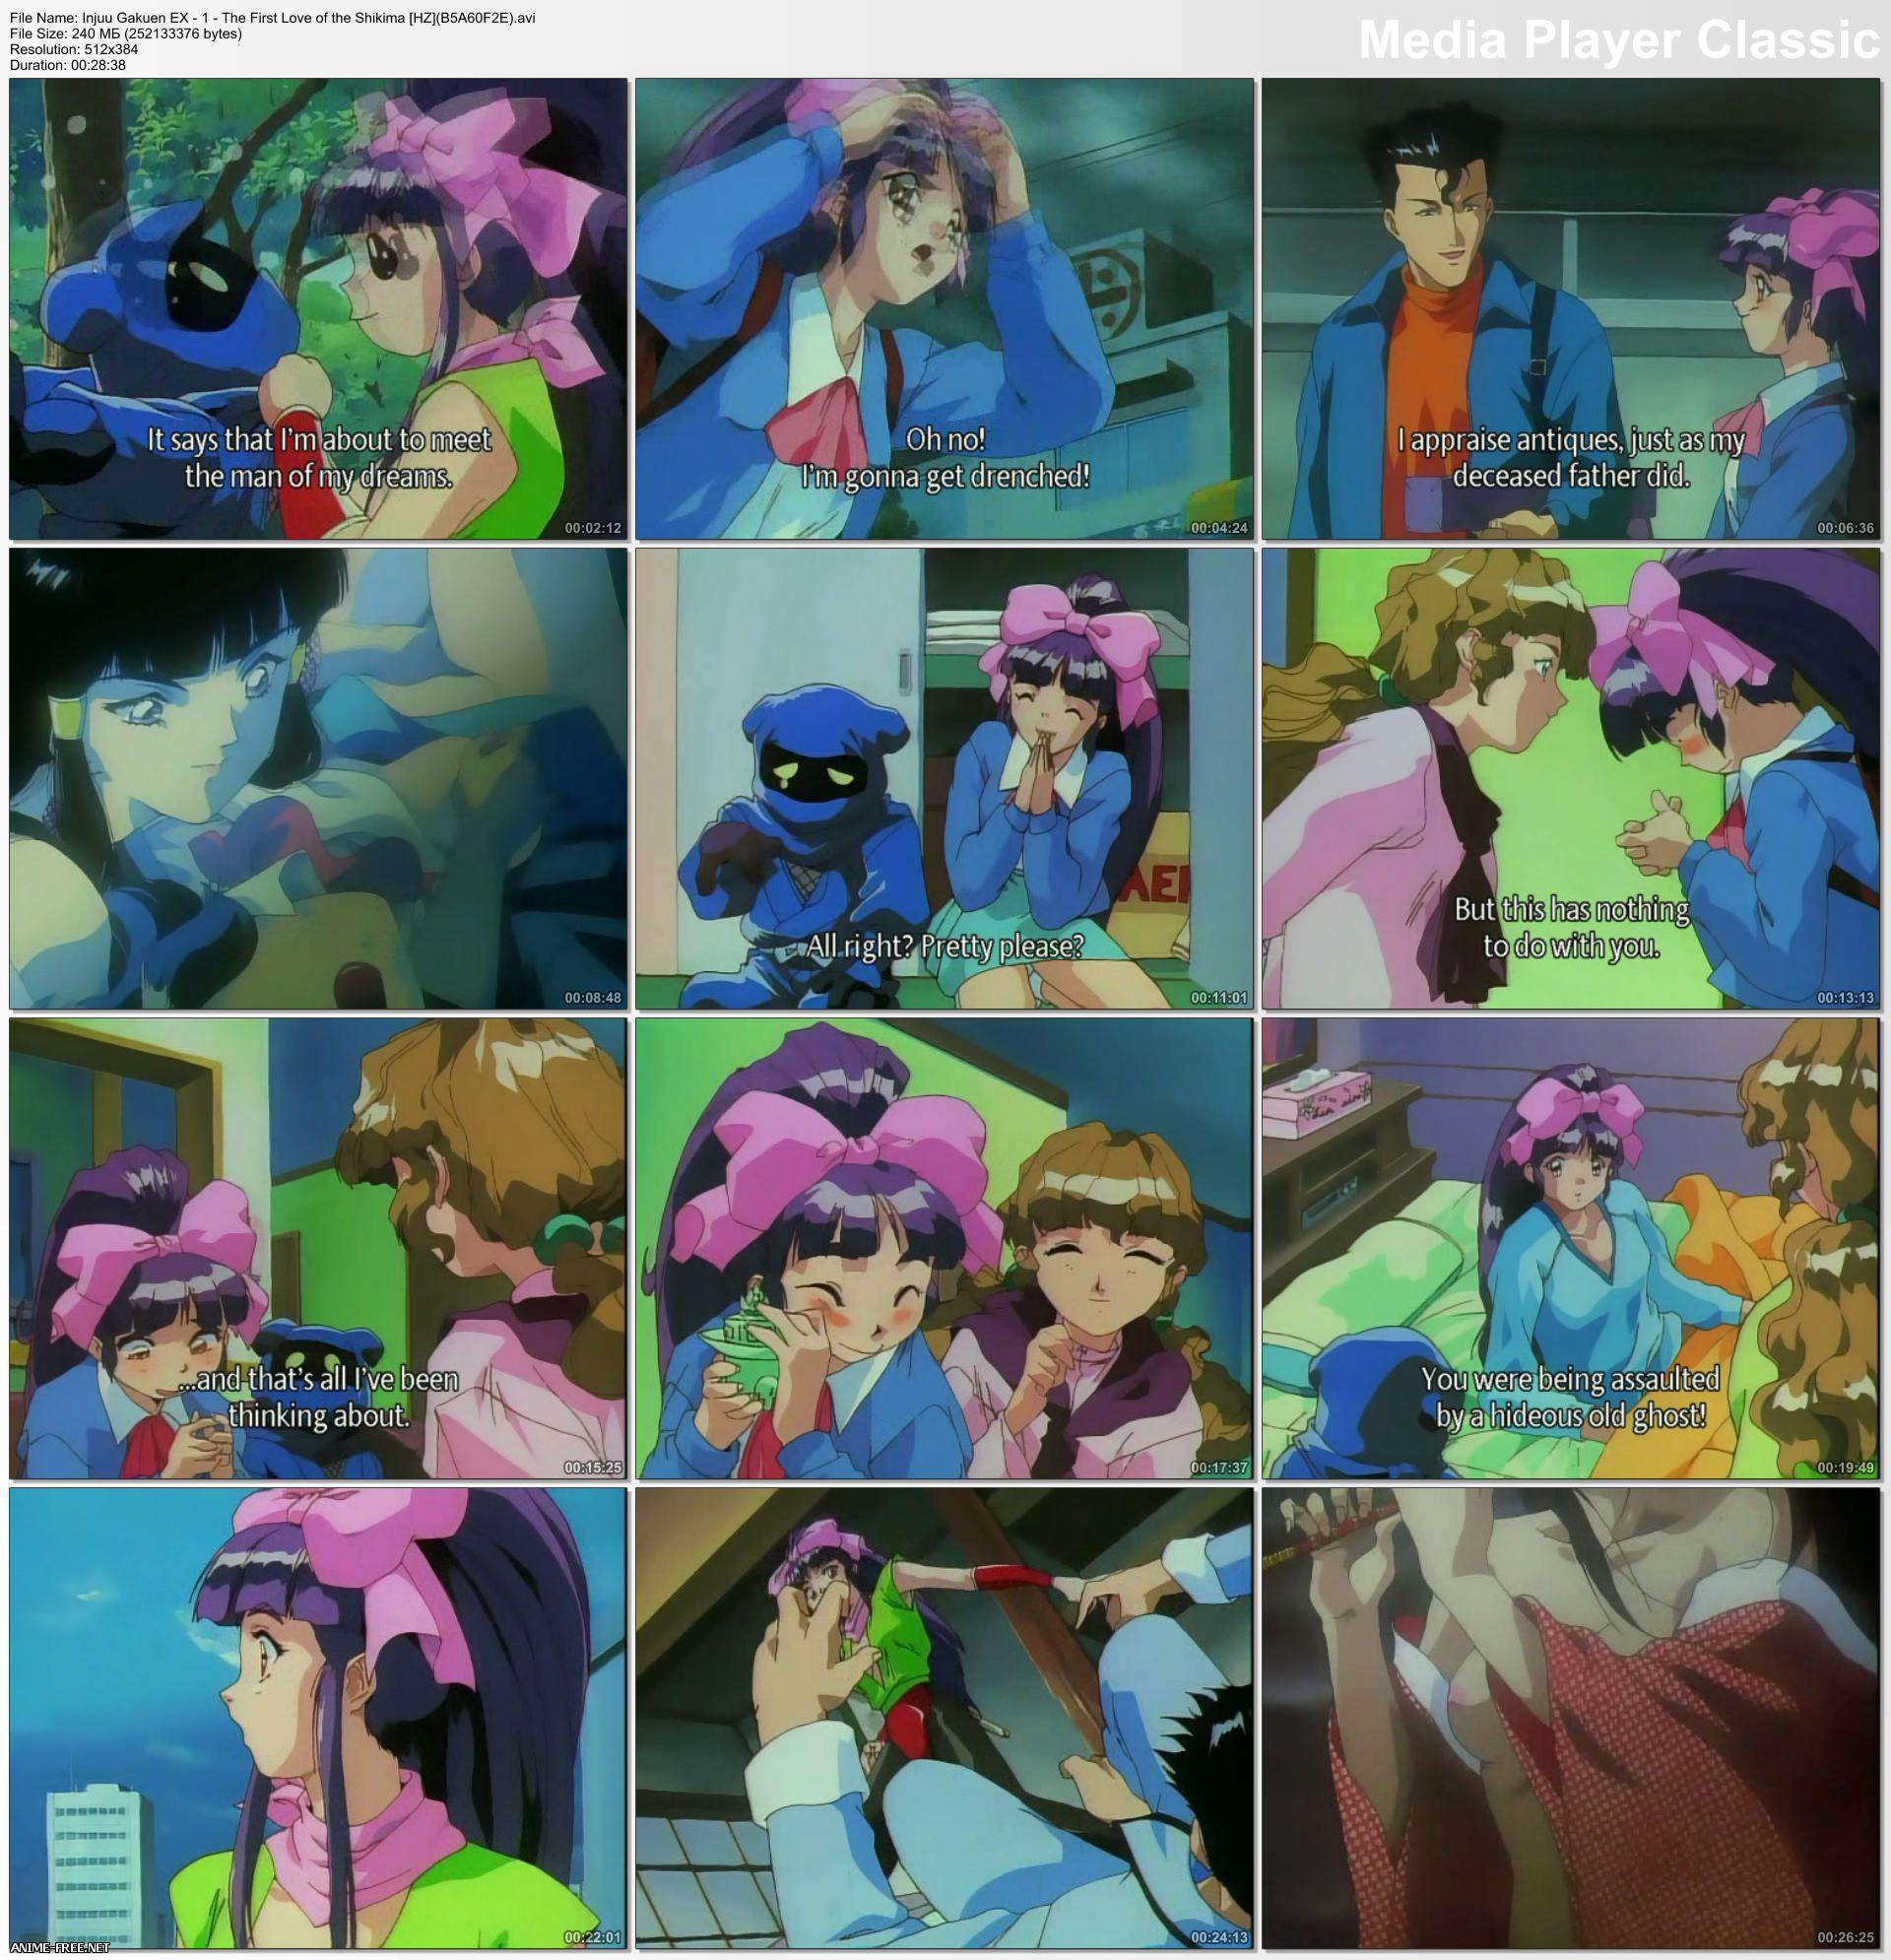 Lady Blue / Injuu Gakuen EX / Синяя леди [4 из 4] [RUS,JAP,ENG] Anime Hentai